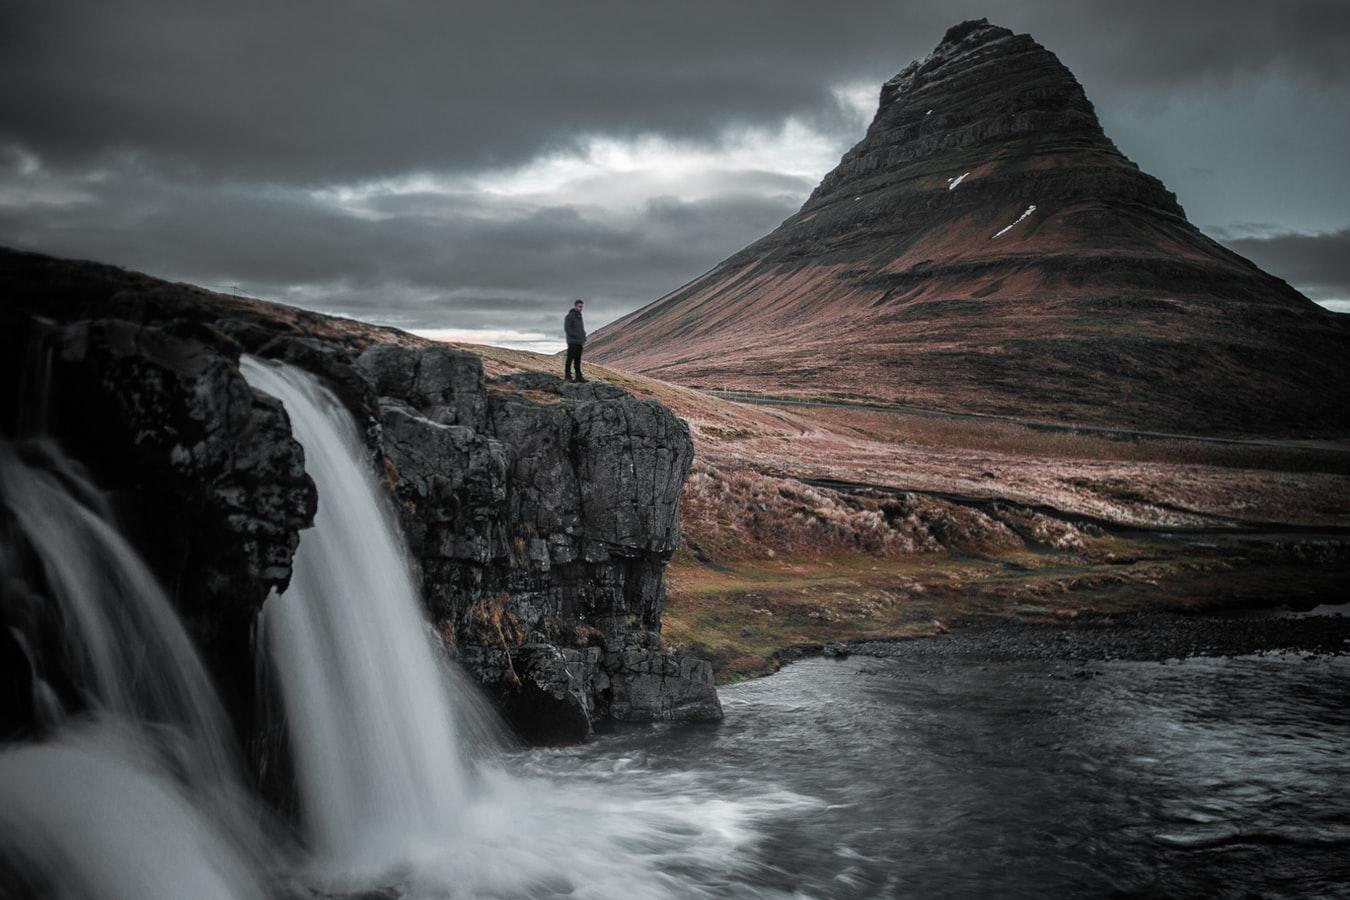 Kirkjufellsfoss waterfall and Kirkjufell mountain in the background